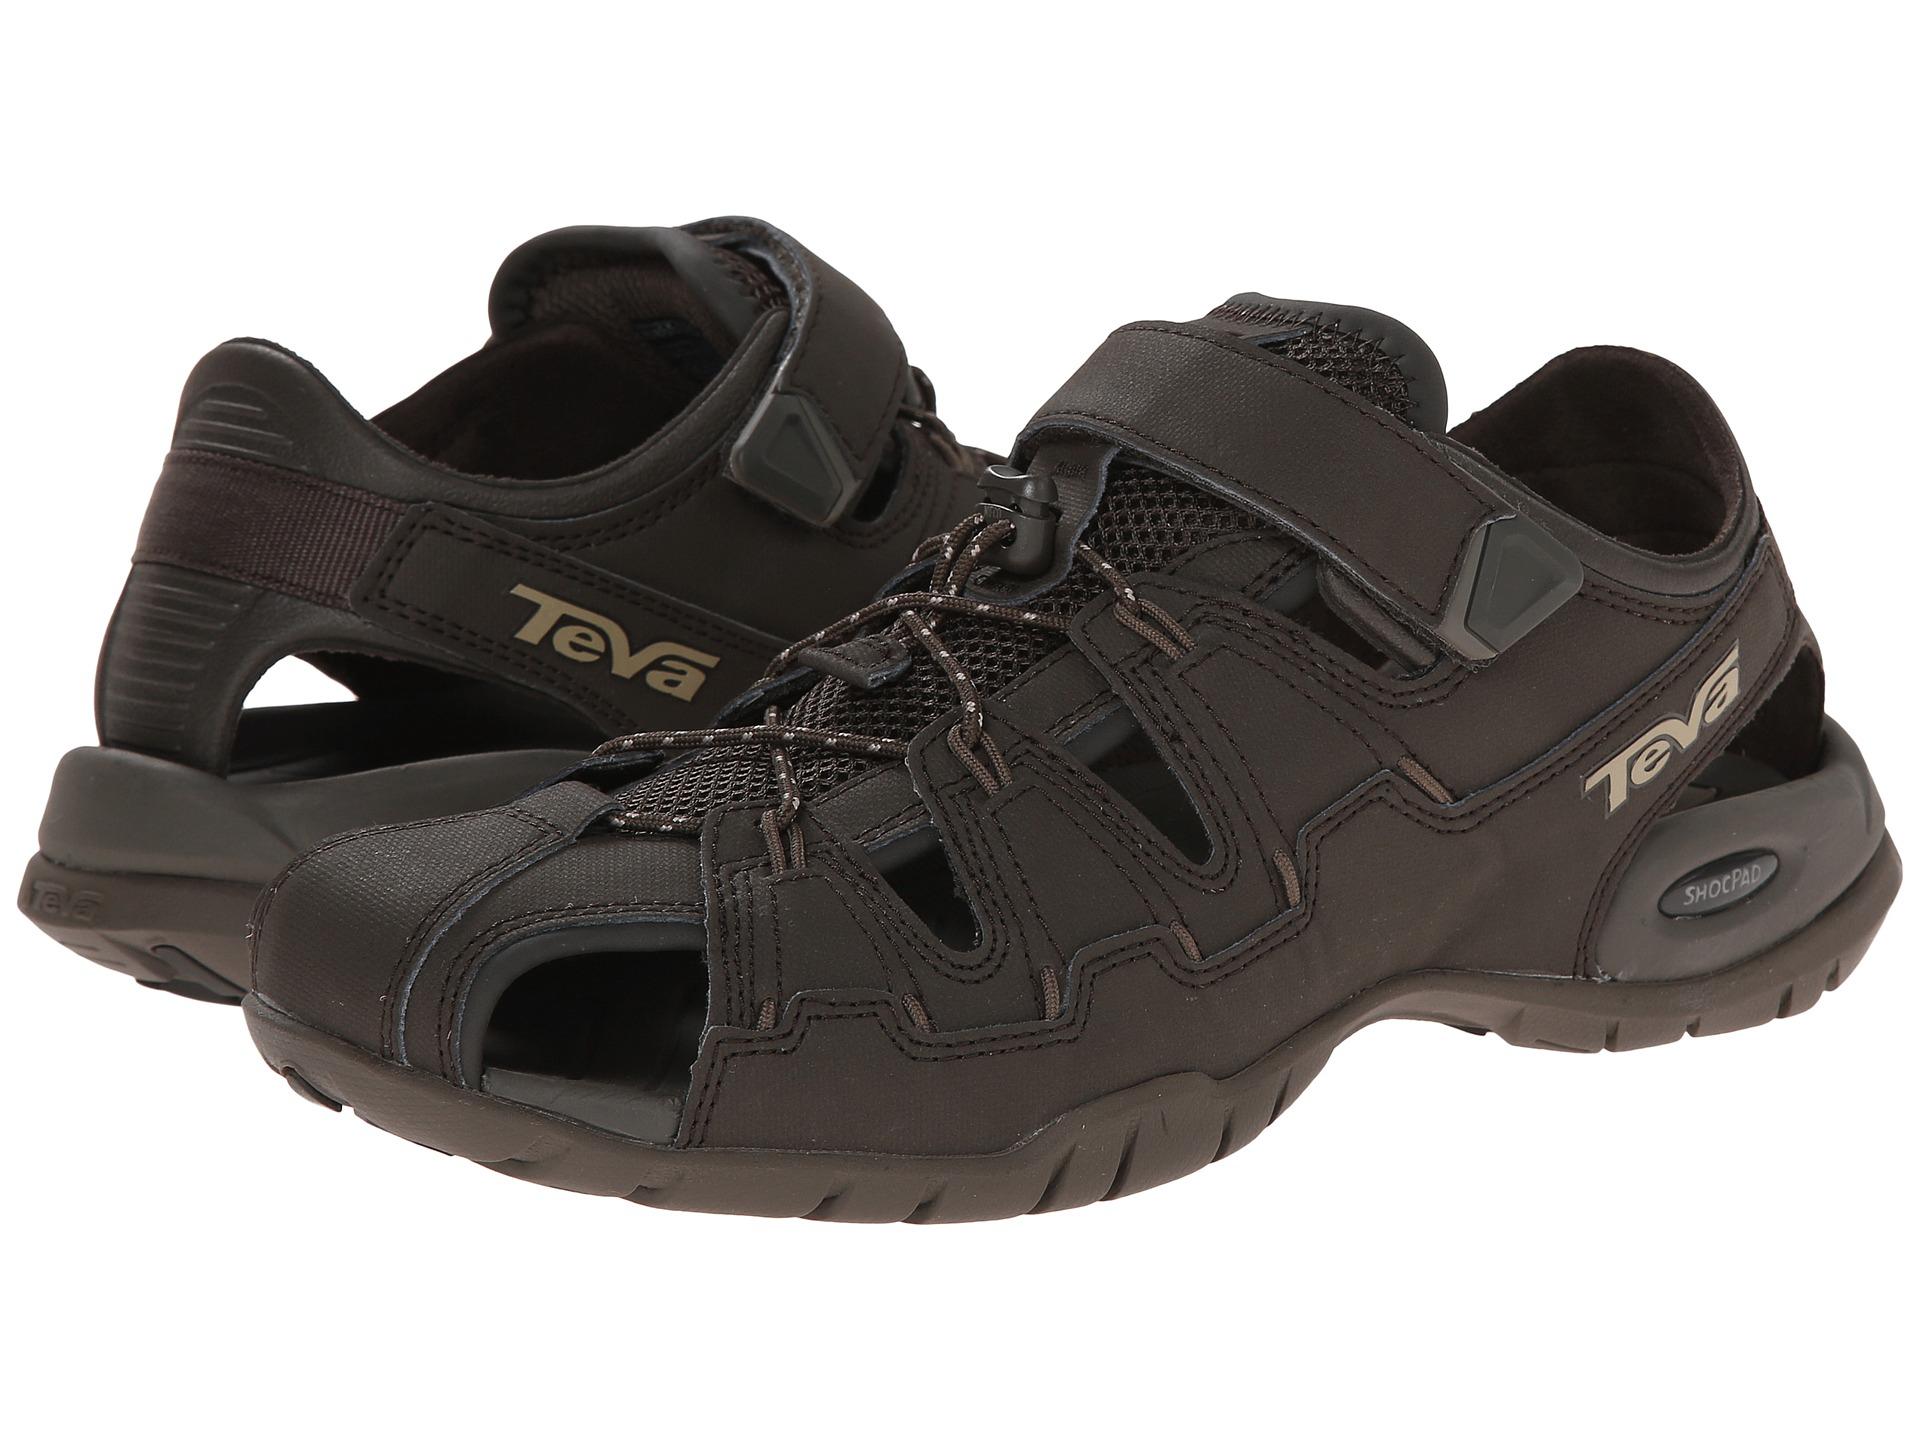 Teva Slip Resistant Shoes Mens